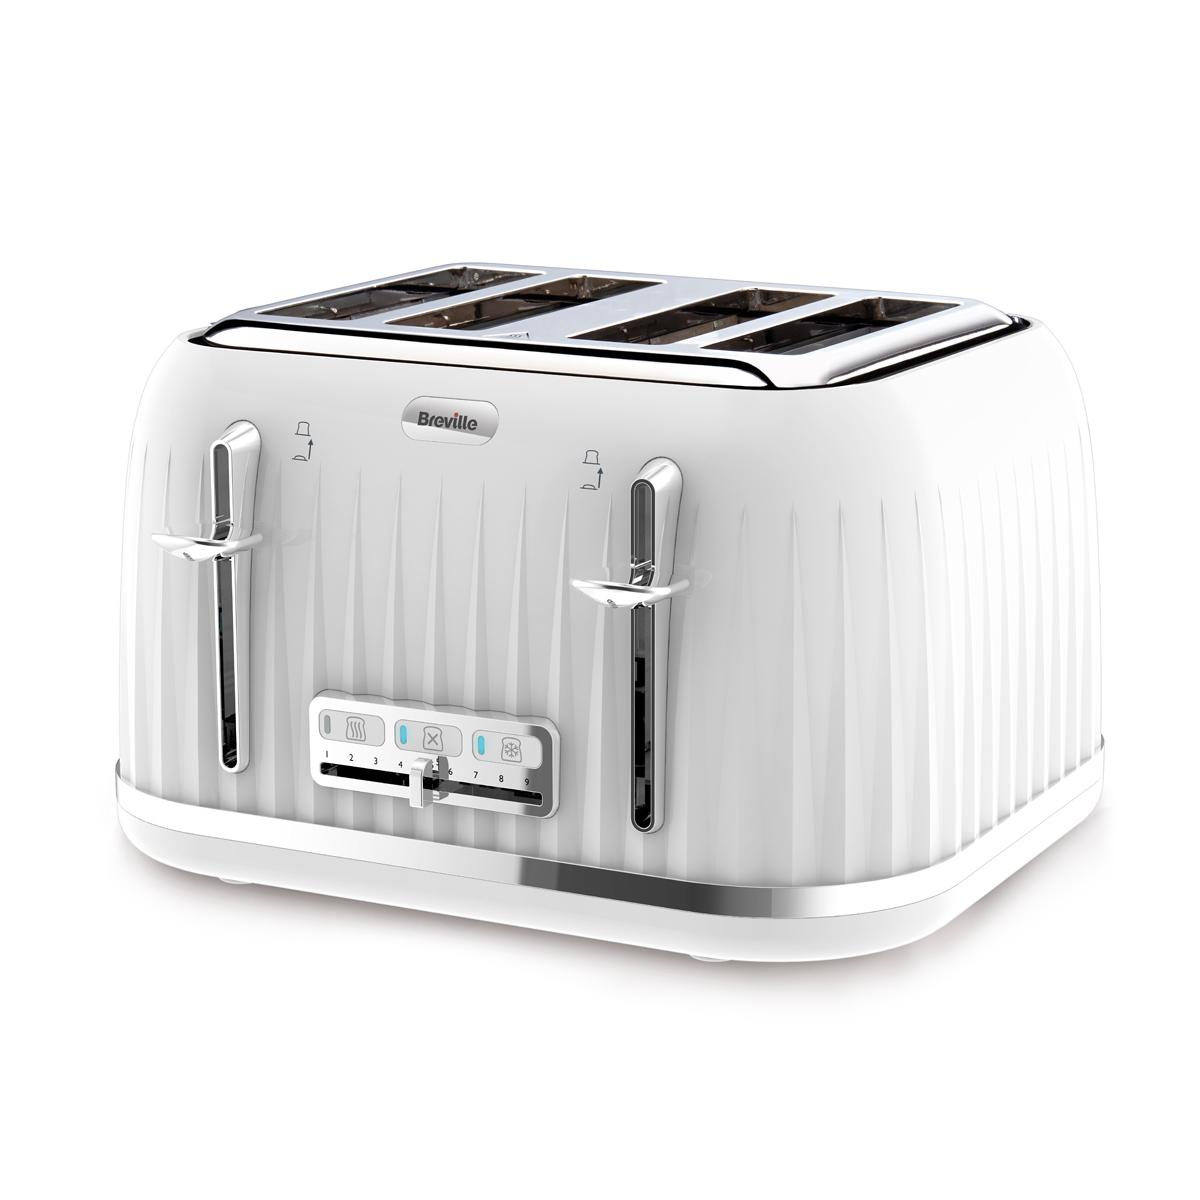 Impressions 4 Slice Toaster, White